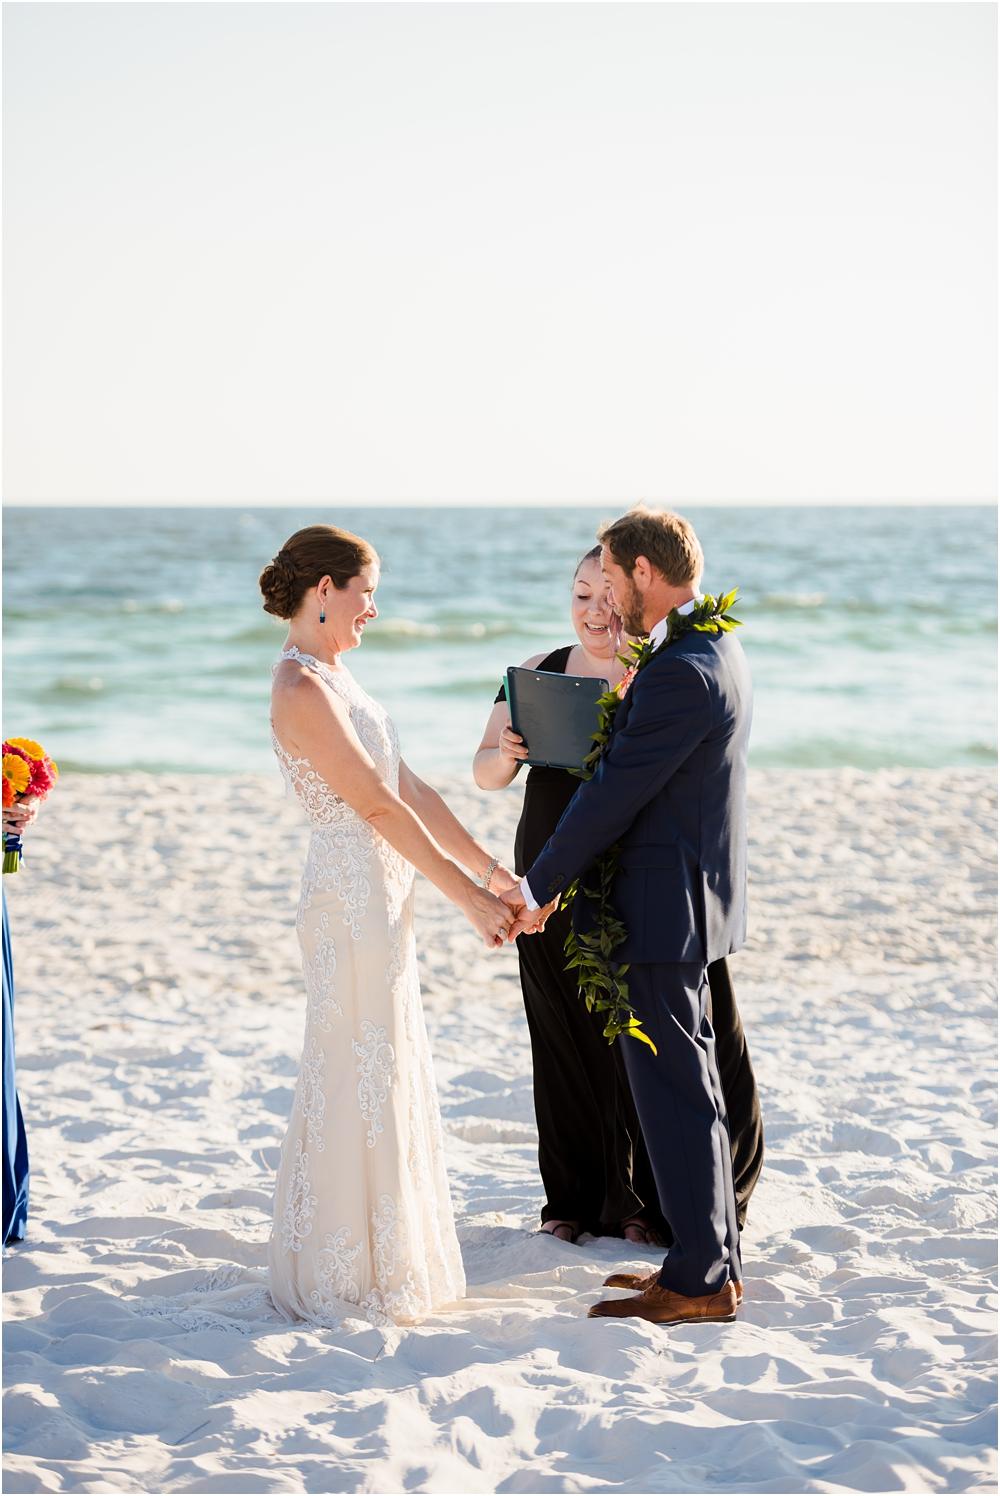 ledman-wedding-kiersten-stevenson-photography-30a-panama-city-beach-dothan-tallahassee-(235-of-763).JPG